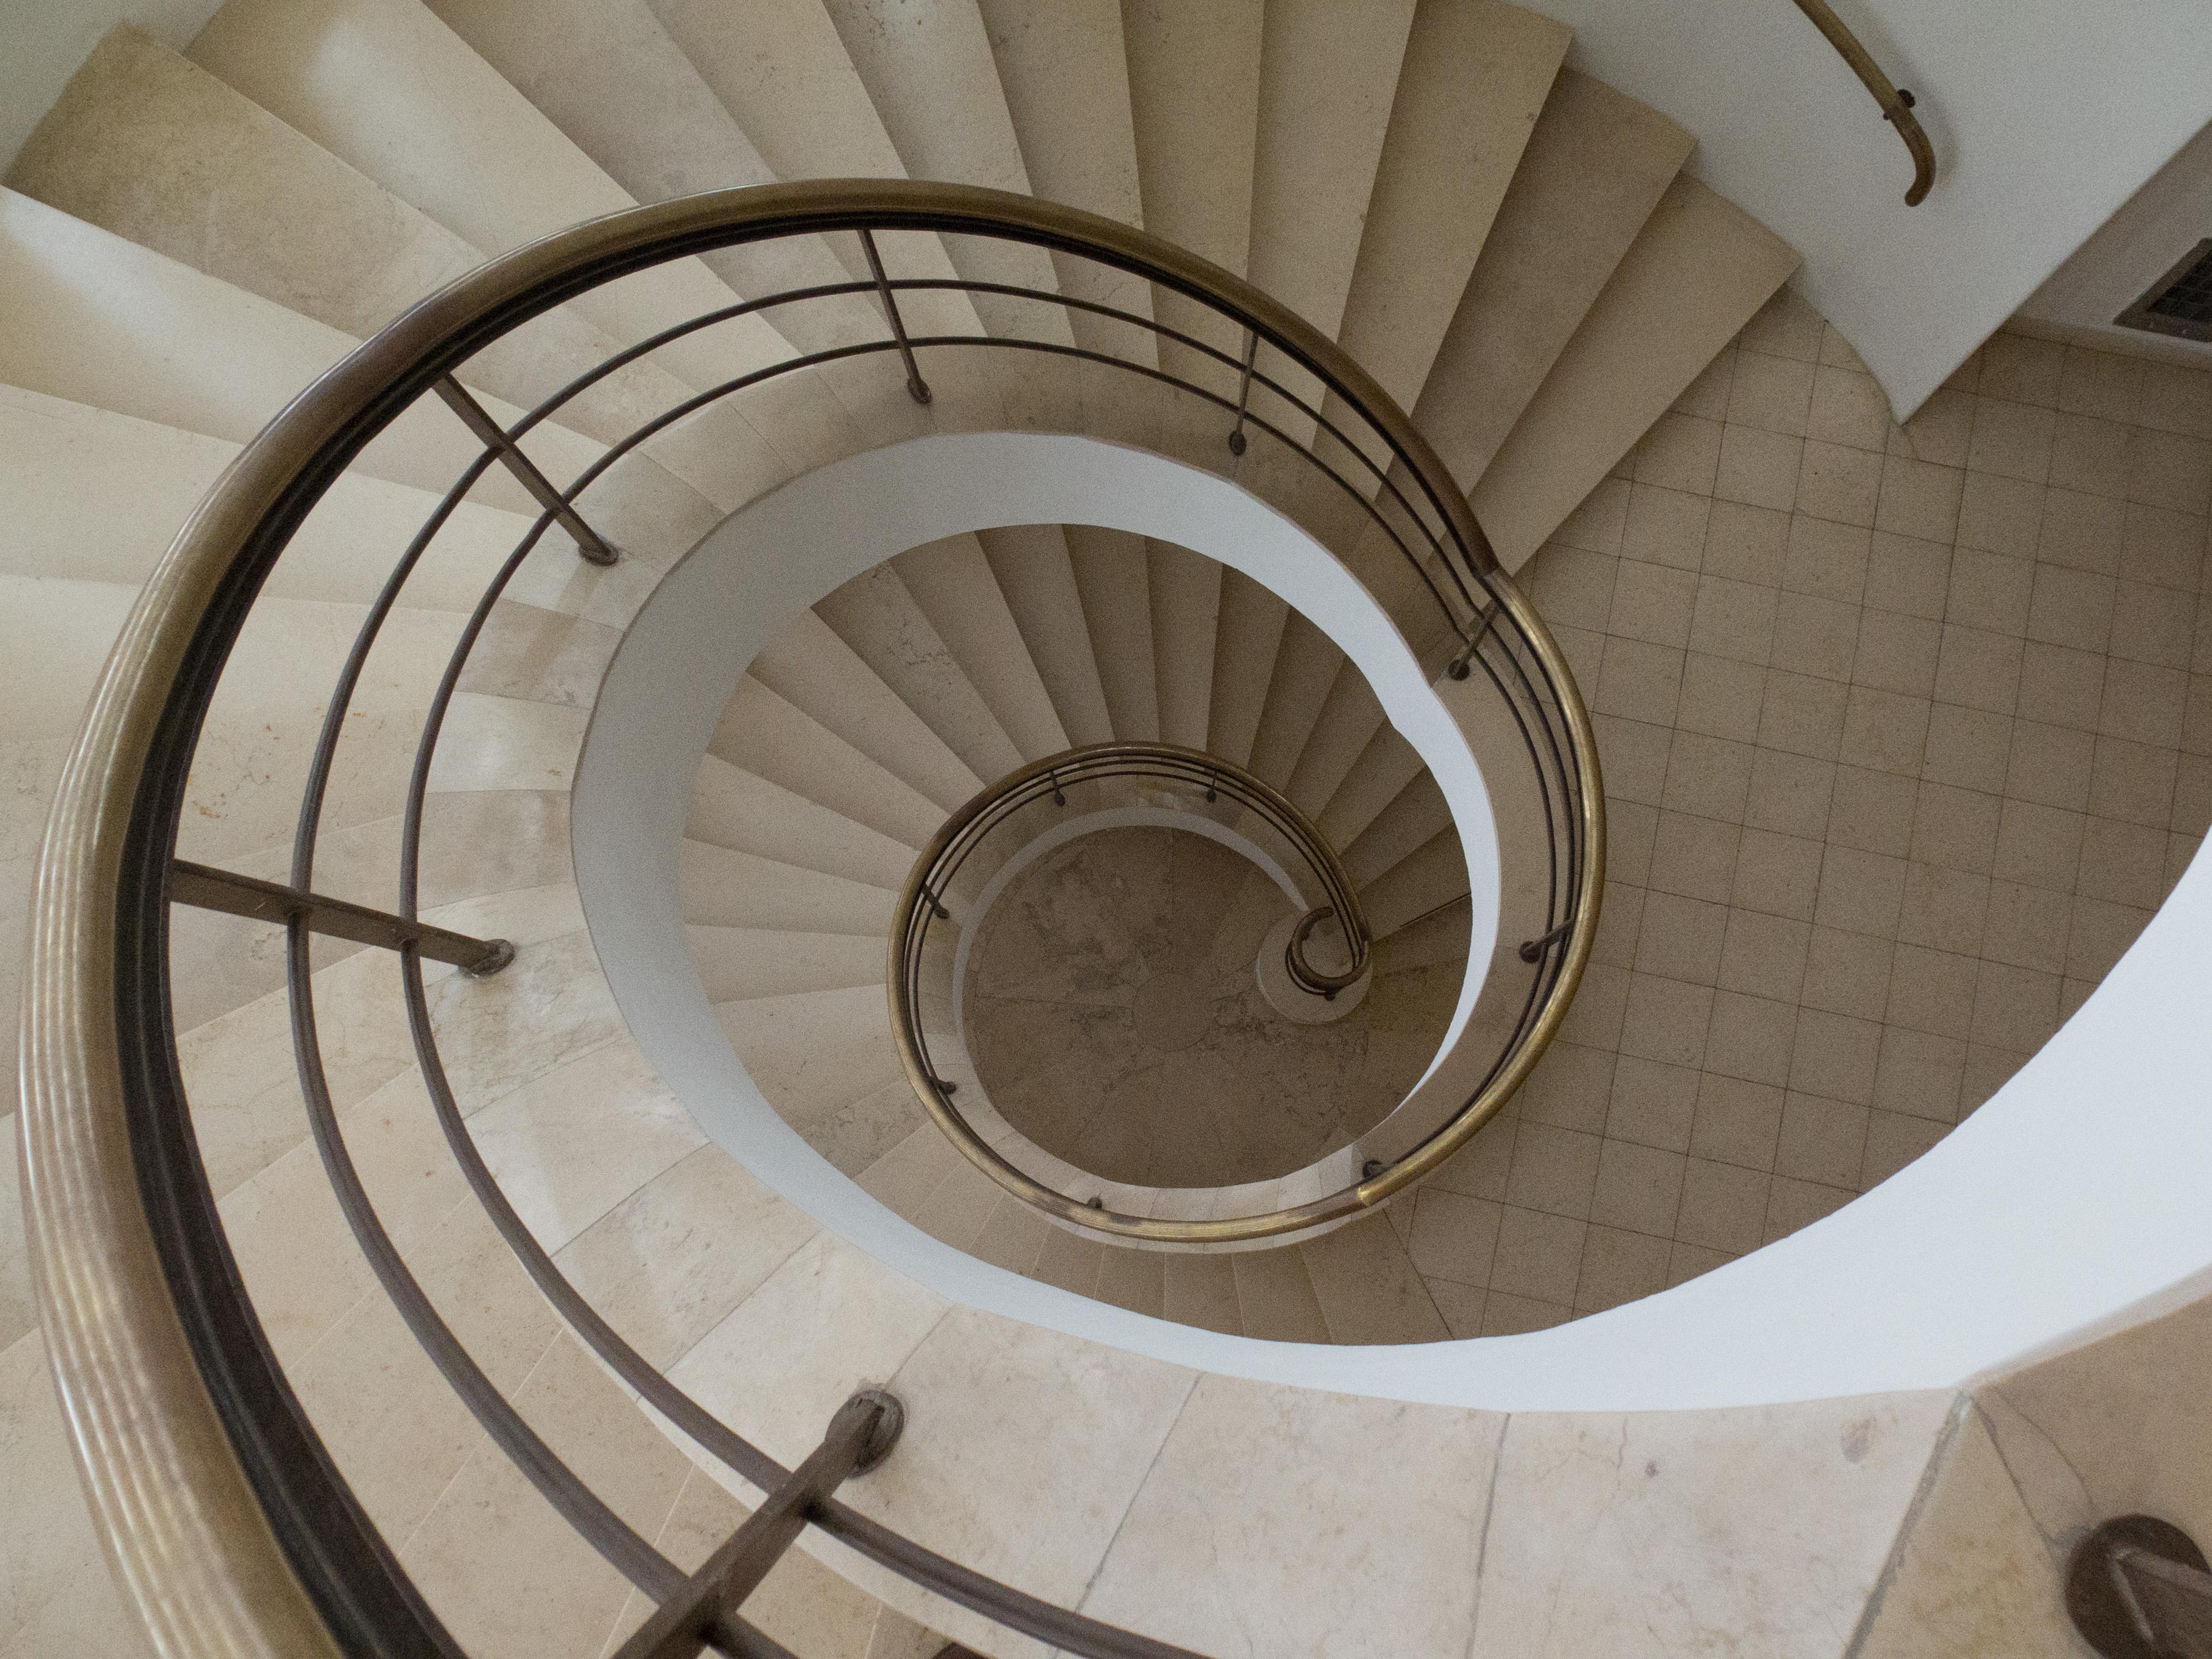 Amazing File:Interior View Down Spiral Staircase Tower Beit Weizmann House